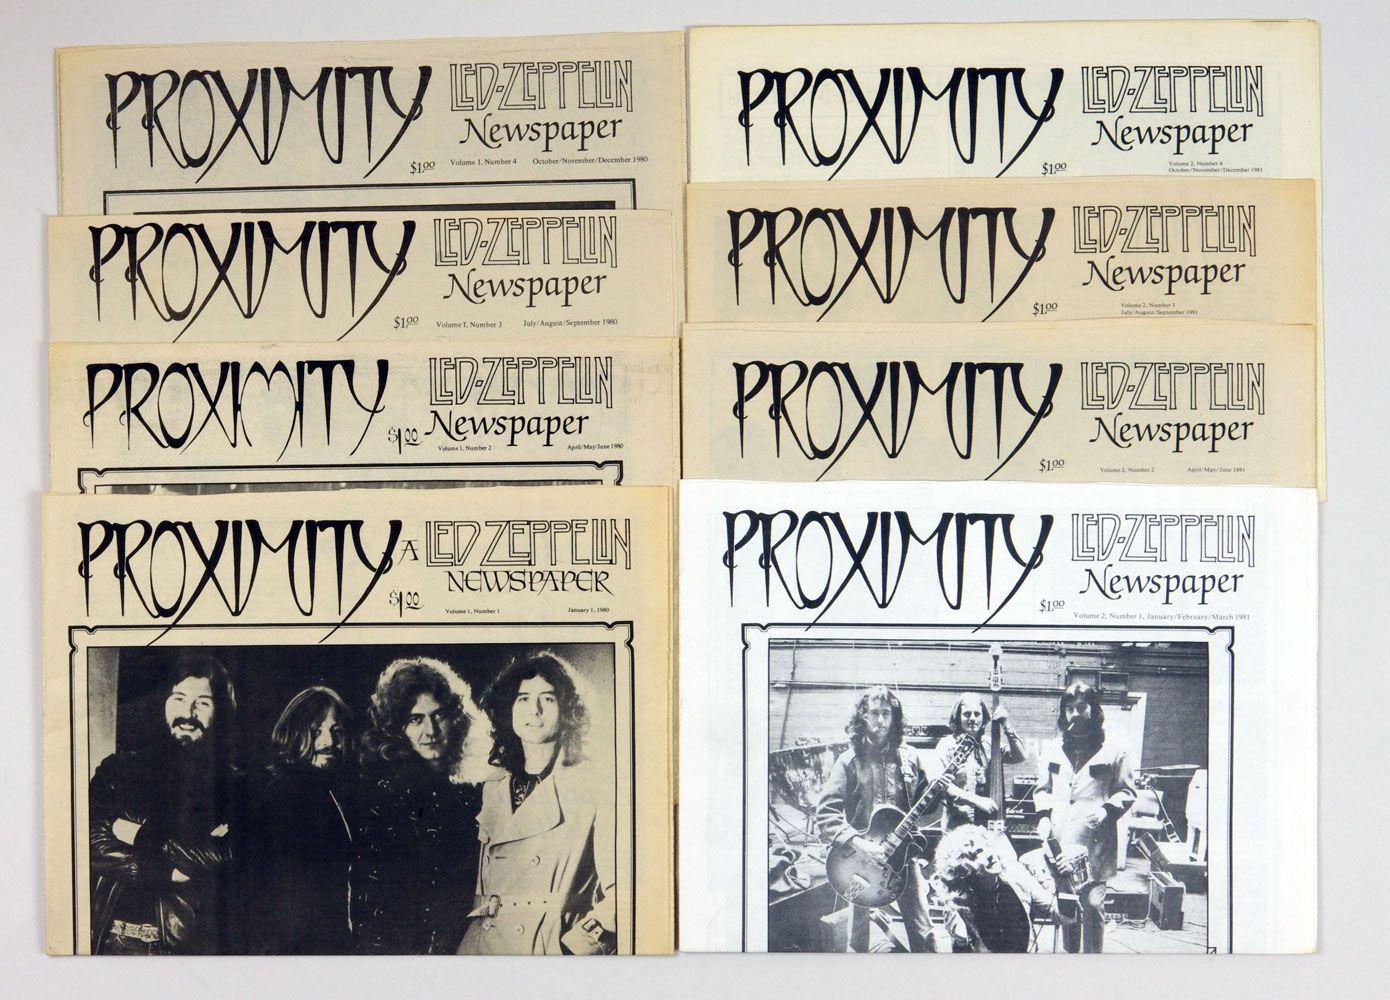 Led Zeppelin Proximity Fanzine 1980 - 1981 Vol. 1 thru 8 First 2 years complete